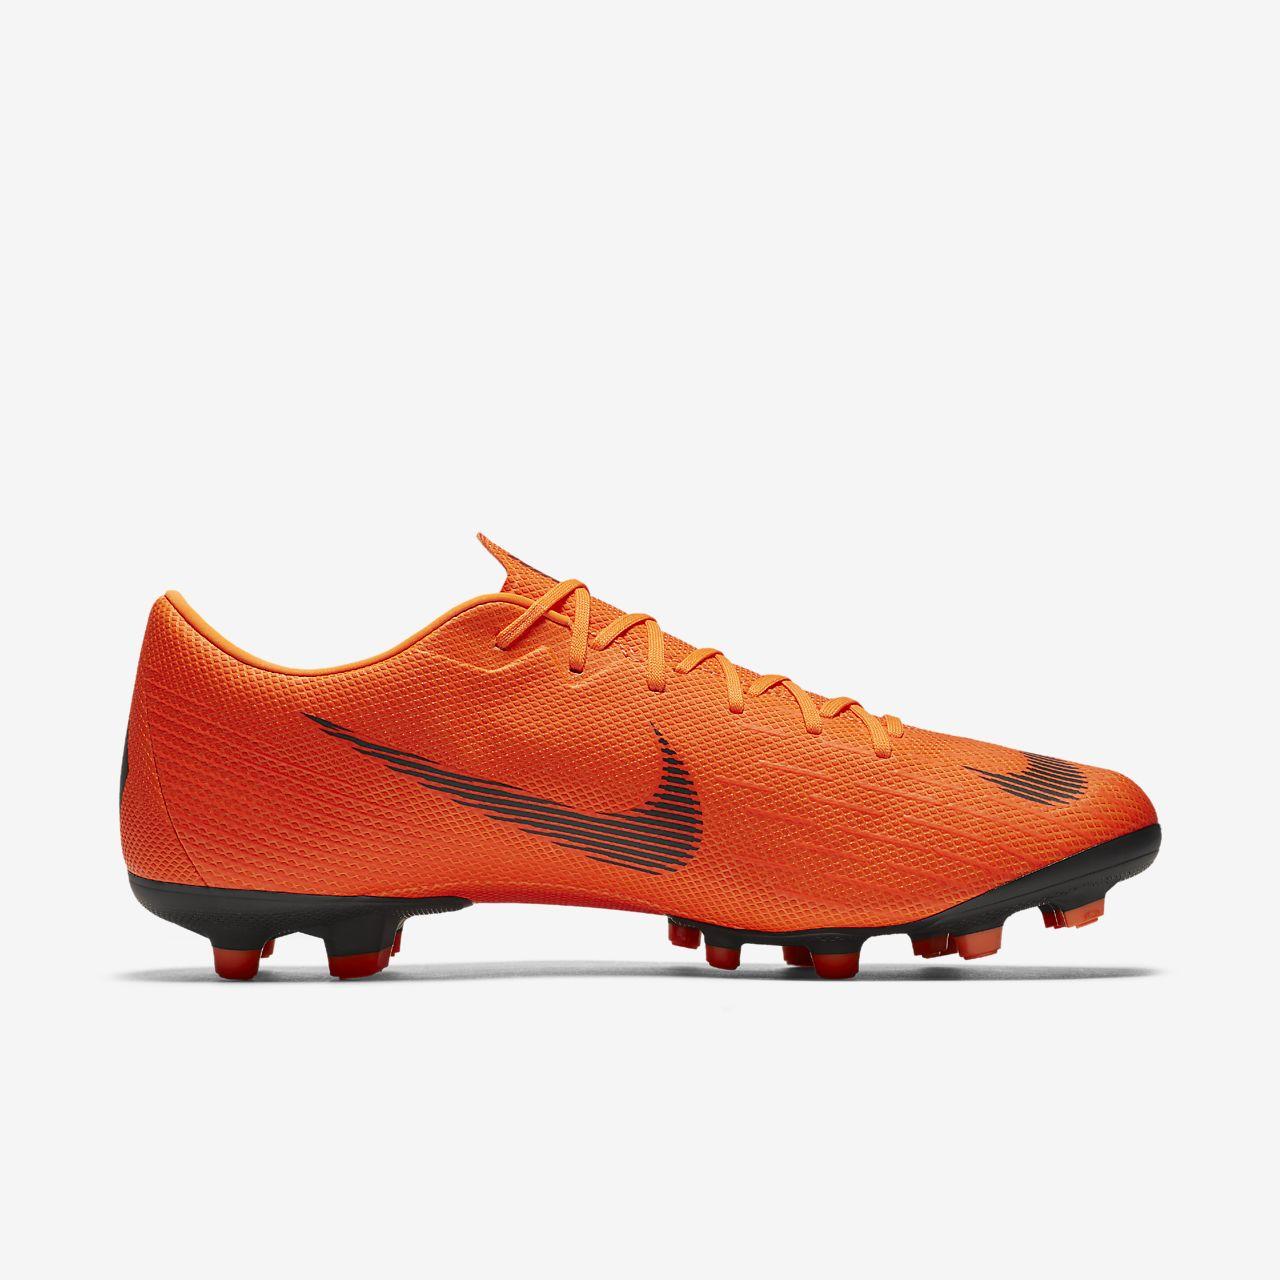 Nike Mercurial Vapor XII Academy MG, Chaussures de Football Homme, Orange (Total Orange/White-T 810), 44.5 EU